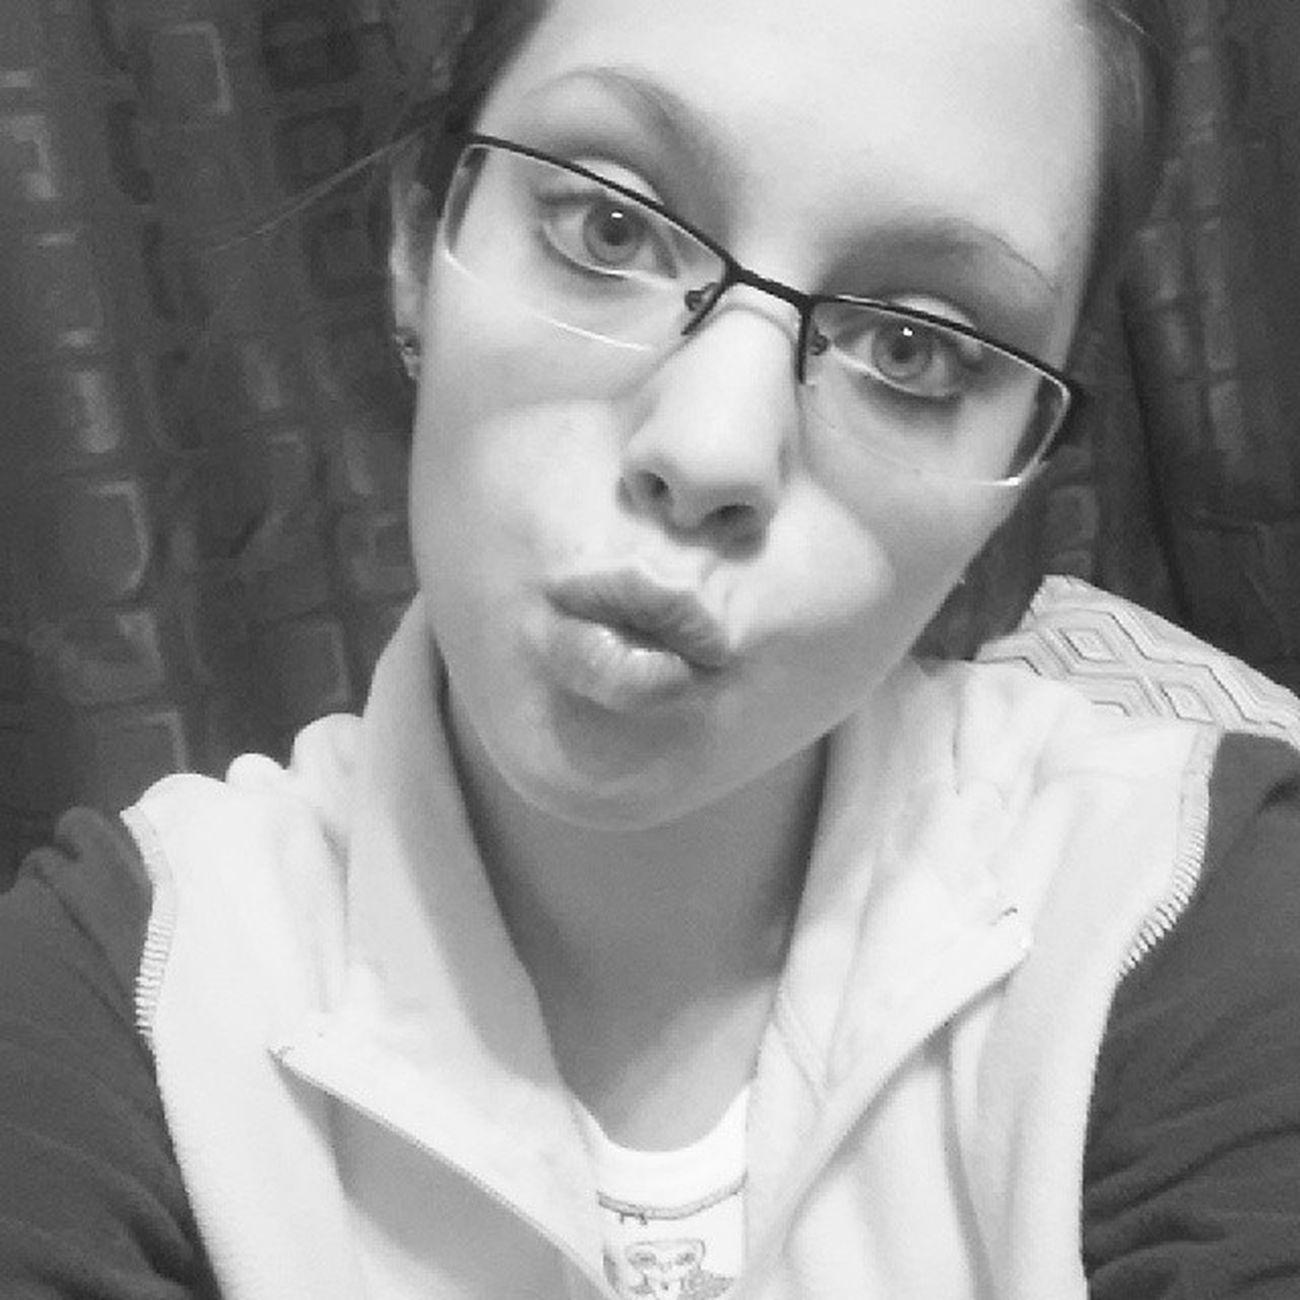 Late night selfie! Tired Bored Austinsasleep Wah @austin_dingess